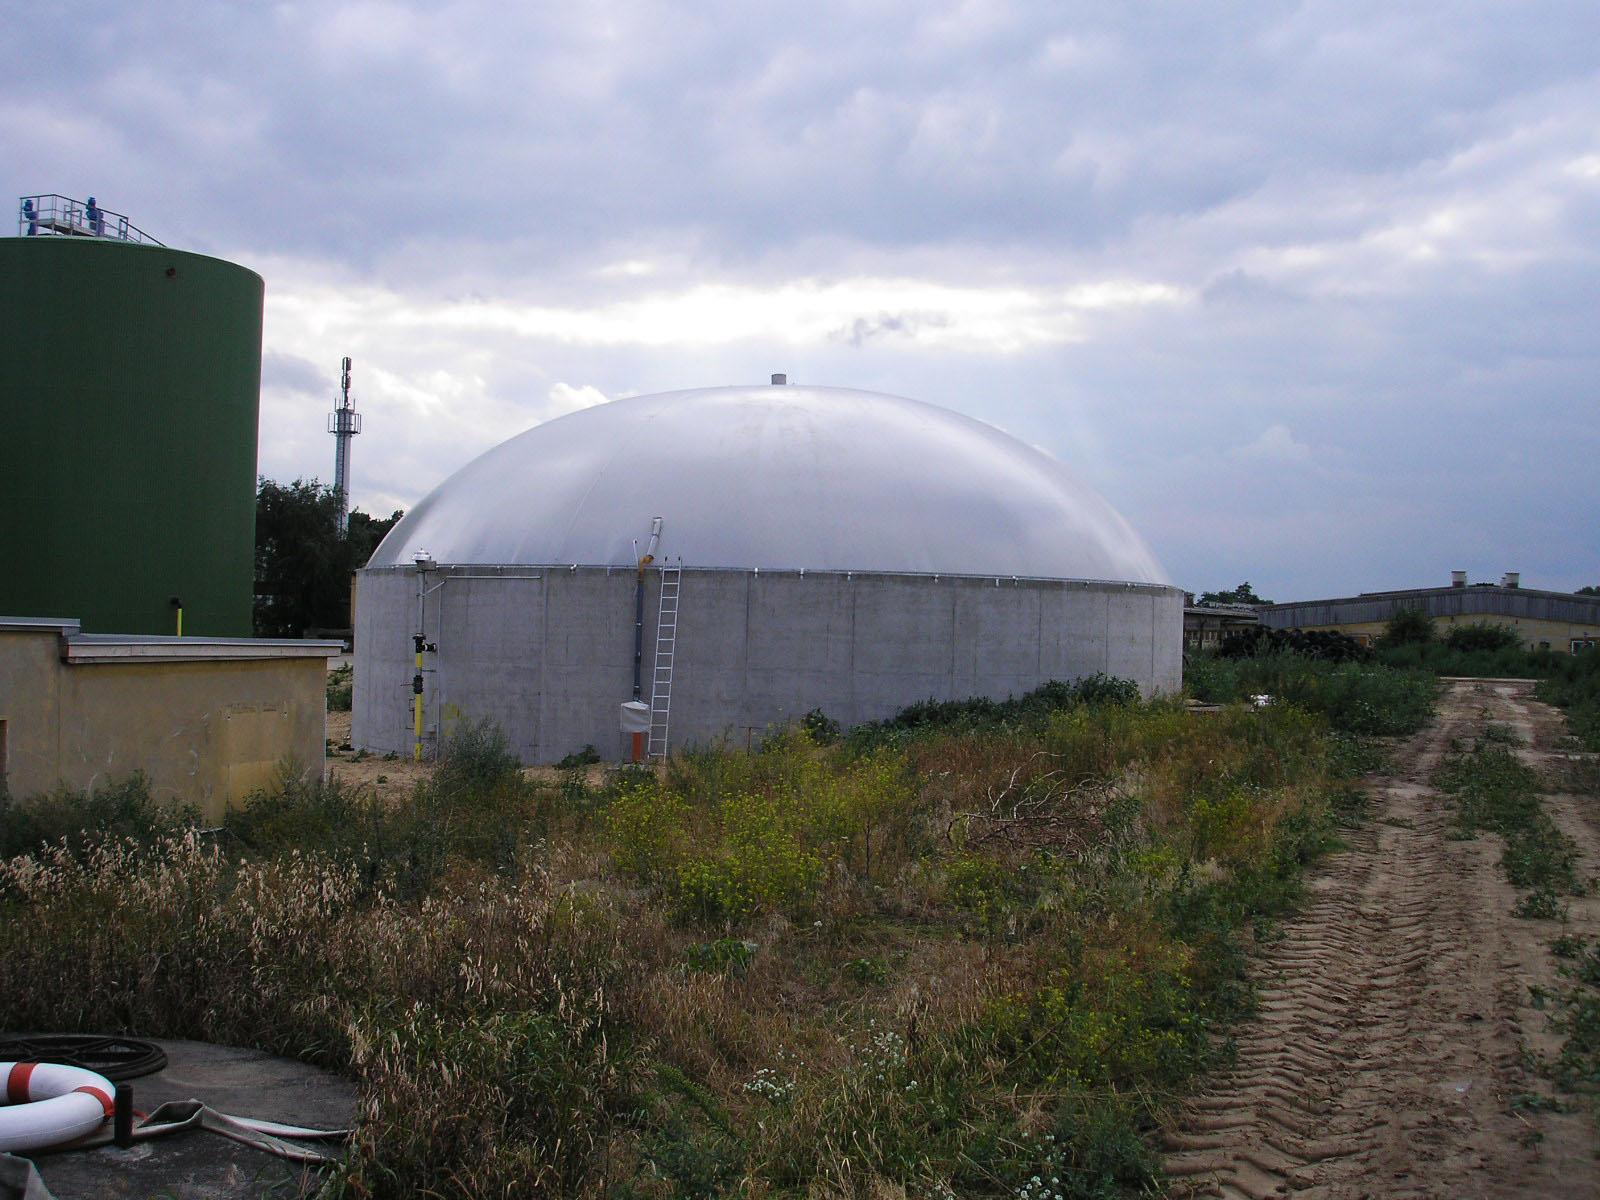 Biogaslager Berlin